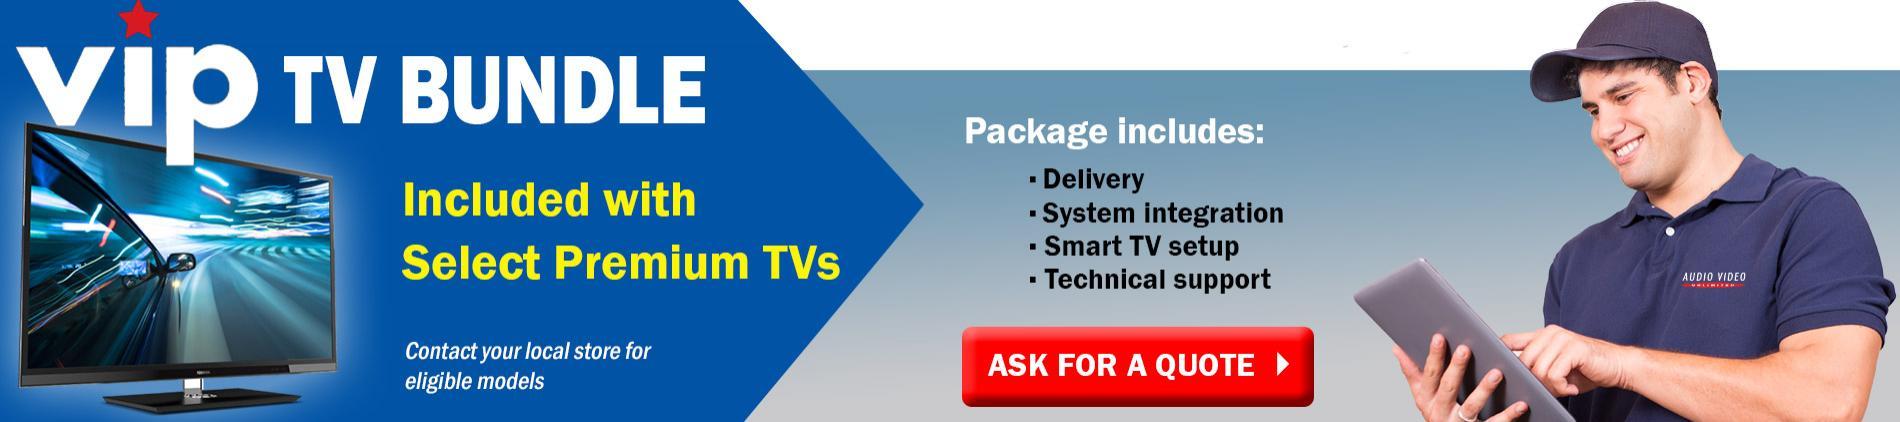 Free,installation,tv bundle,vip,delivery,setup